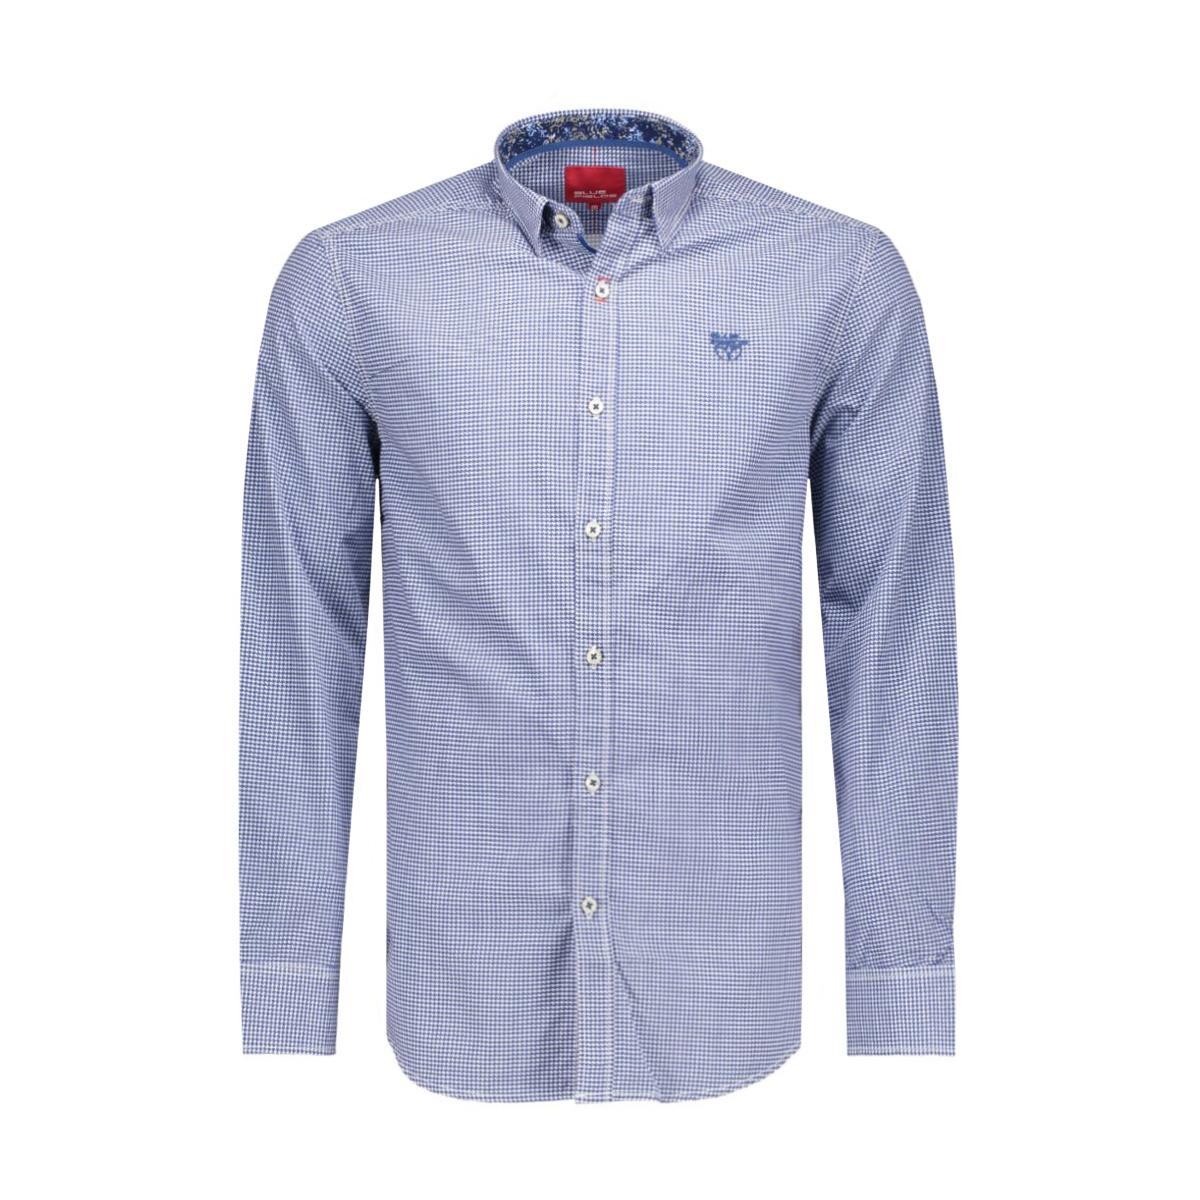 21435002 bluefields overhemd 5711